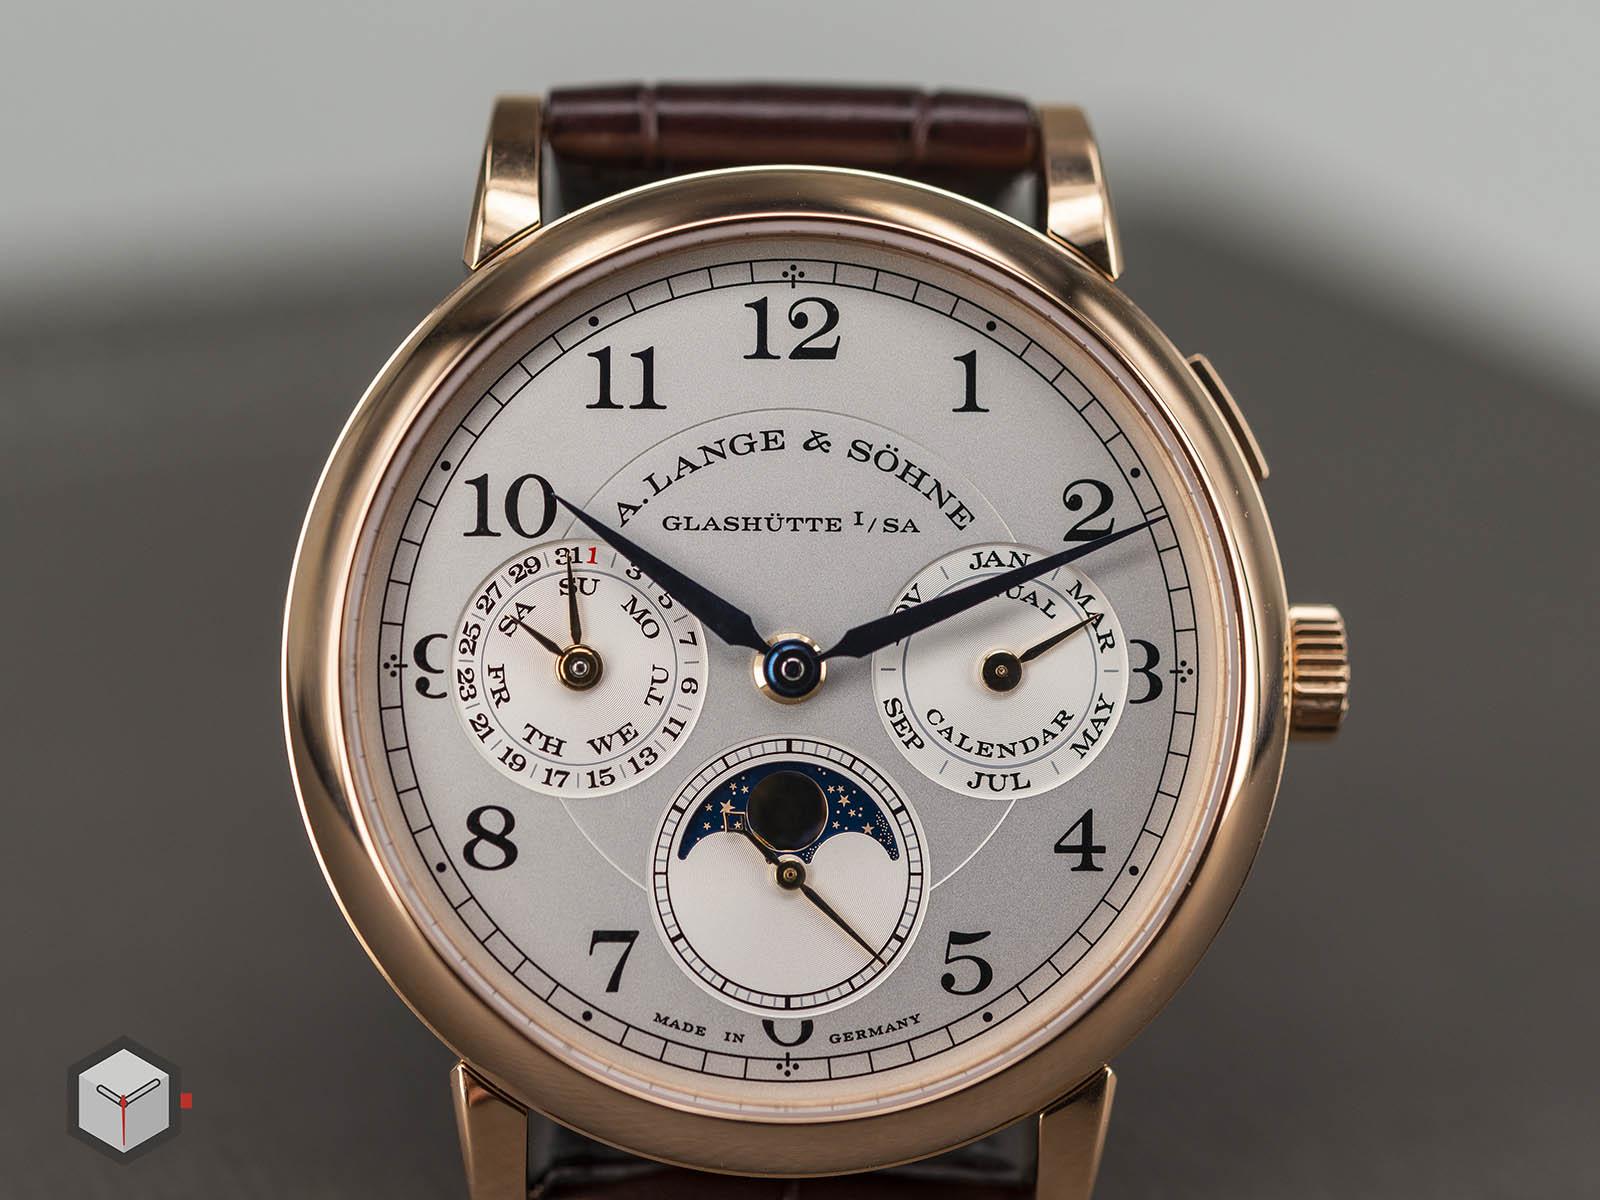 238-032-a-lange-sohne-1815-annual-calendar-18k-pink-gold-5.jpg